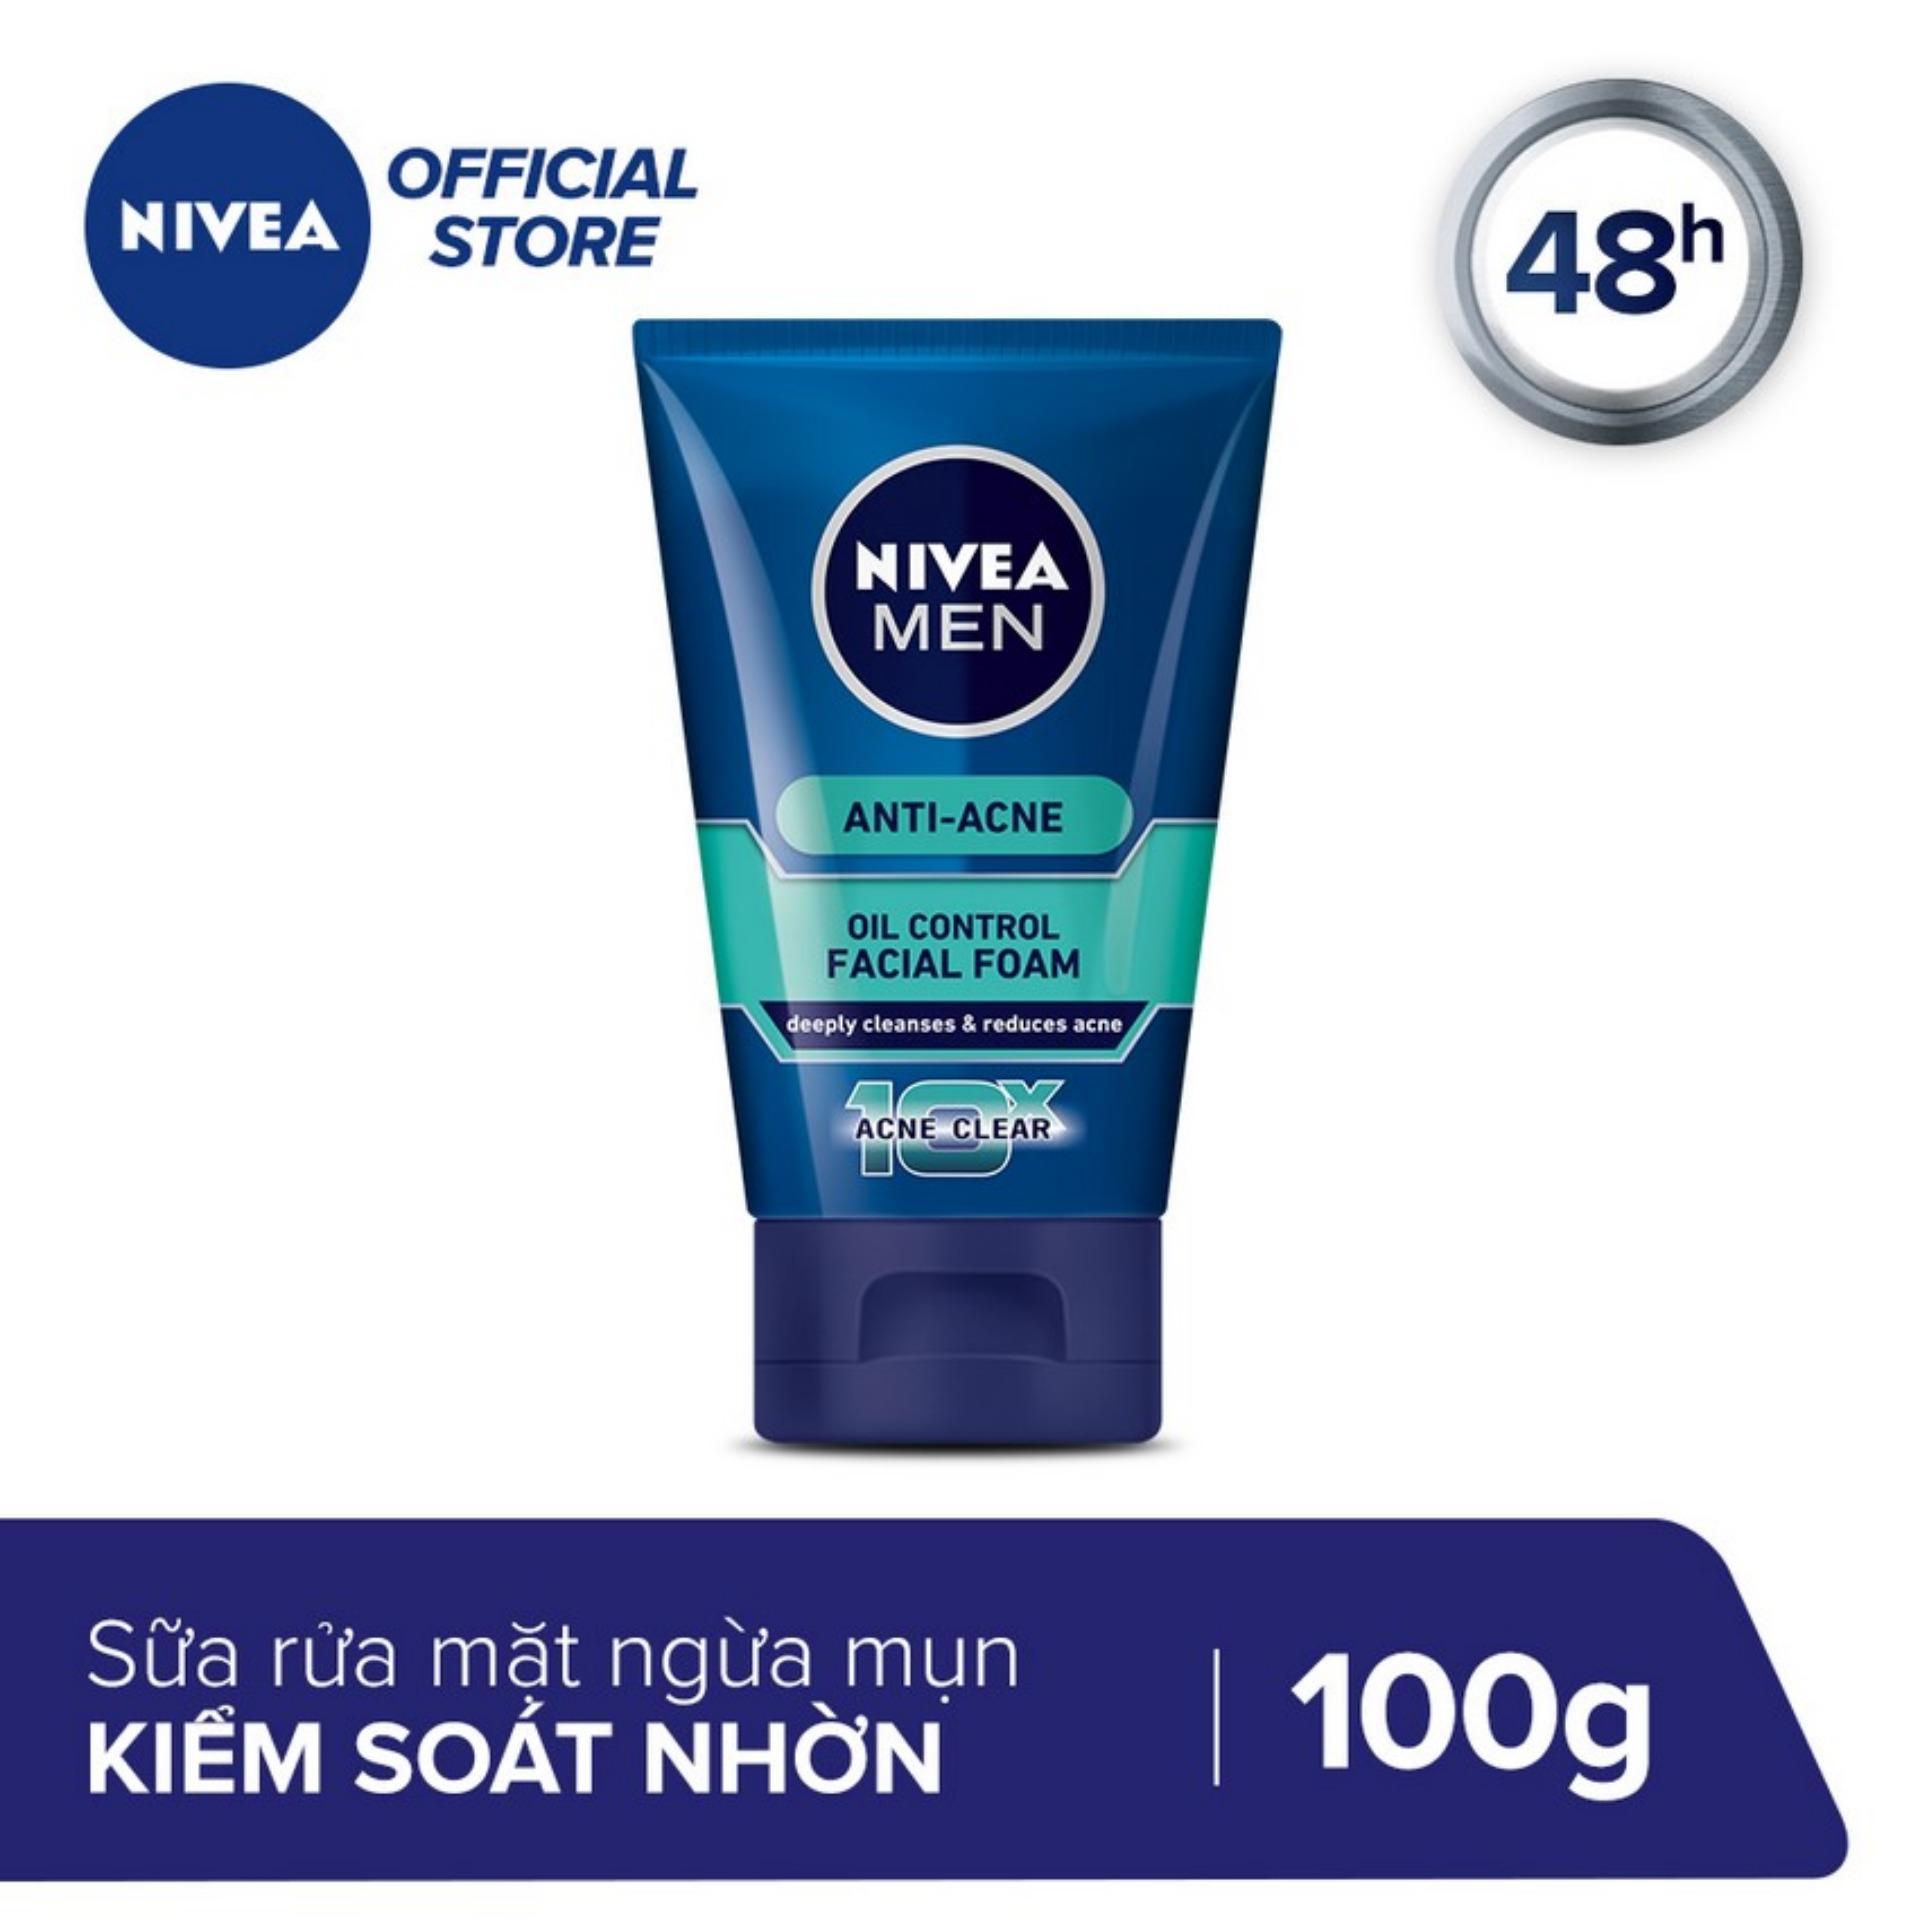 Sữa Rửa Mặt NIVEA MEN Ngừa Mụn Kiểm Soát Nhờn